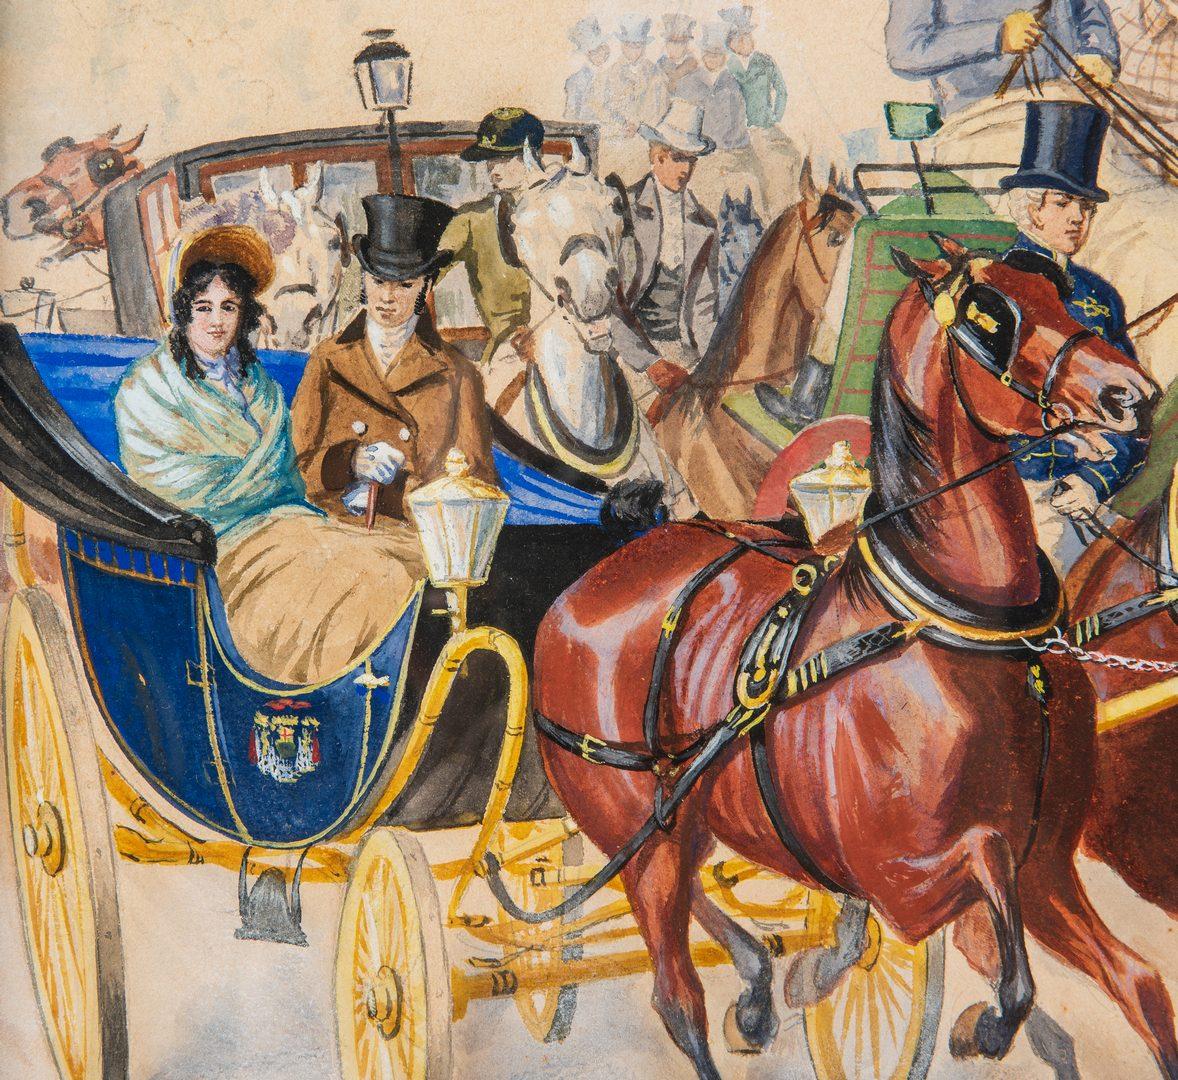 Lot 224: Large European Watercolor Carriage Scene